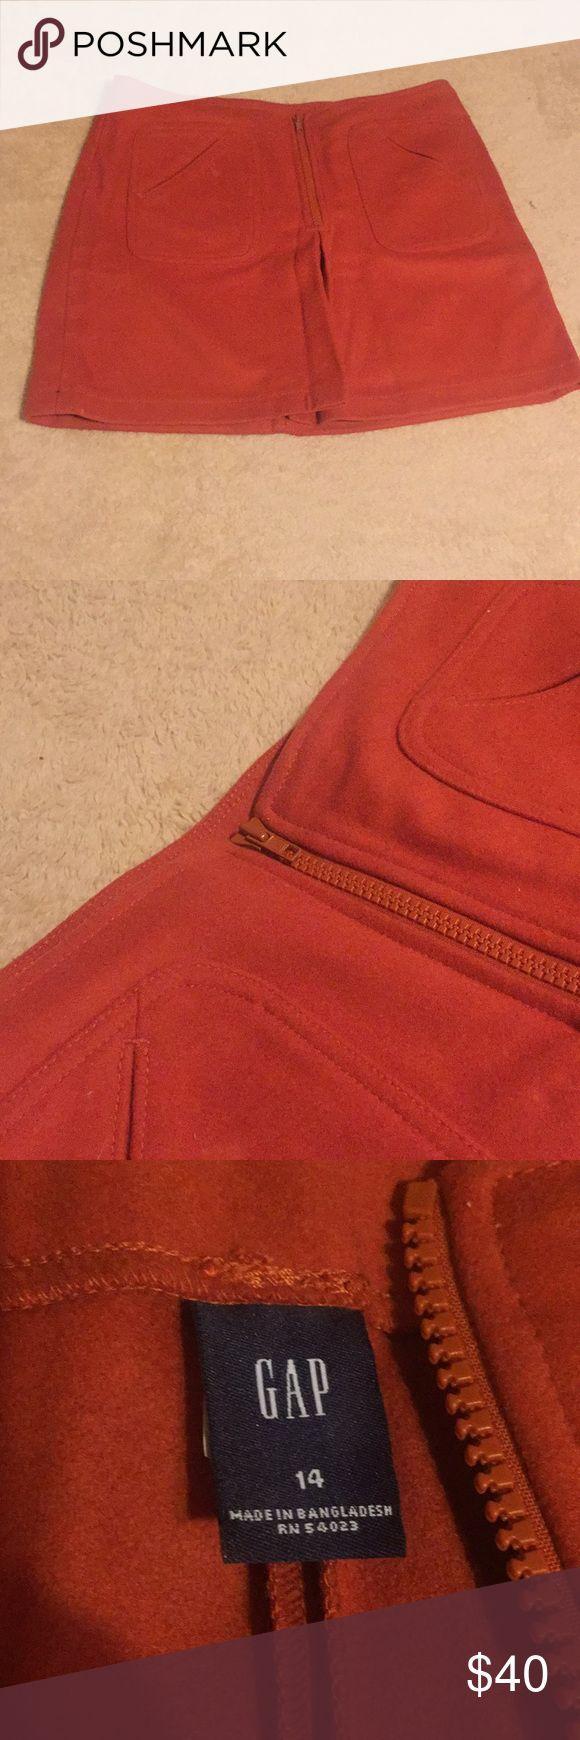 "GAP Virgin Wool Skirt Sz 14 NWOT! Burnt orange skirt 17"" long waist 17"" front zipper front pleat slit front pockets. Not lined very cute just too short for me.  Size 14 GAP Skirts Mini"